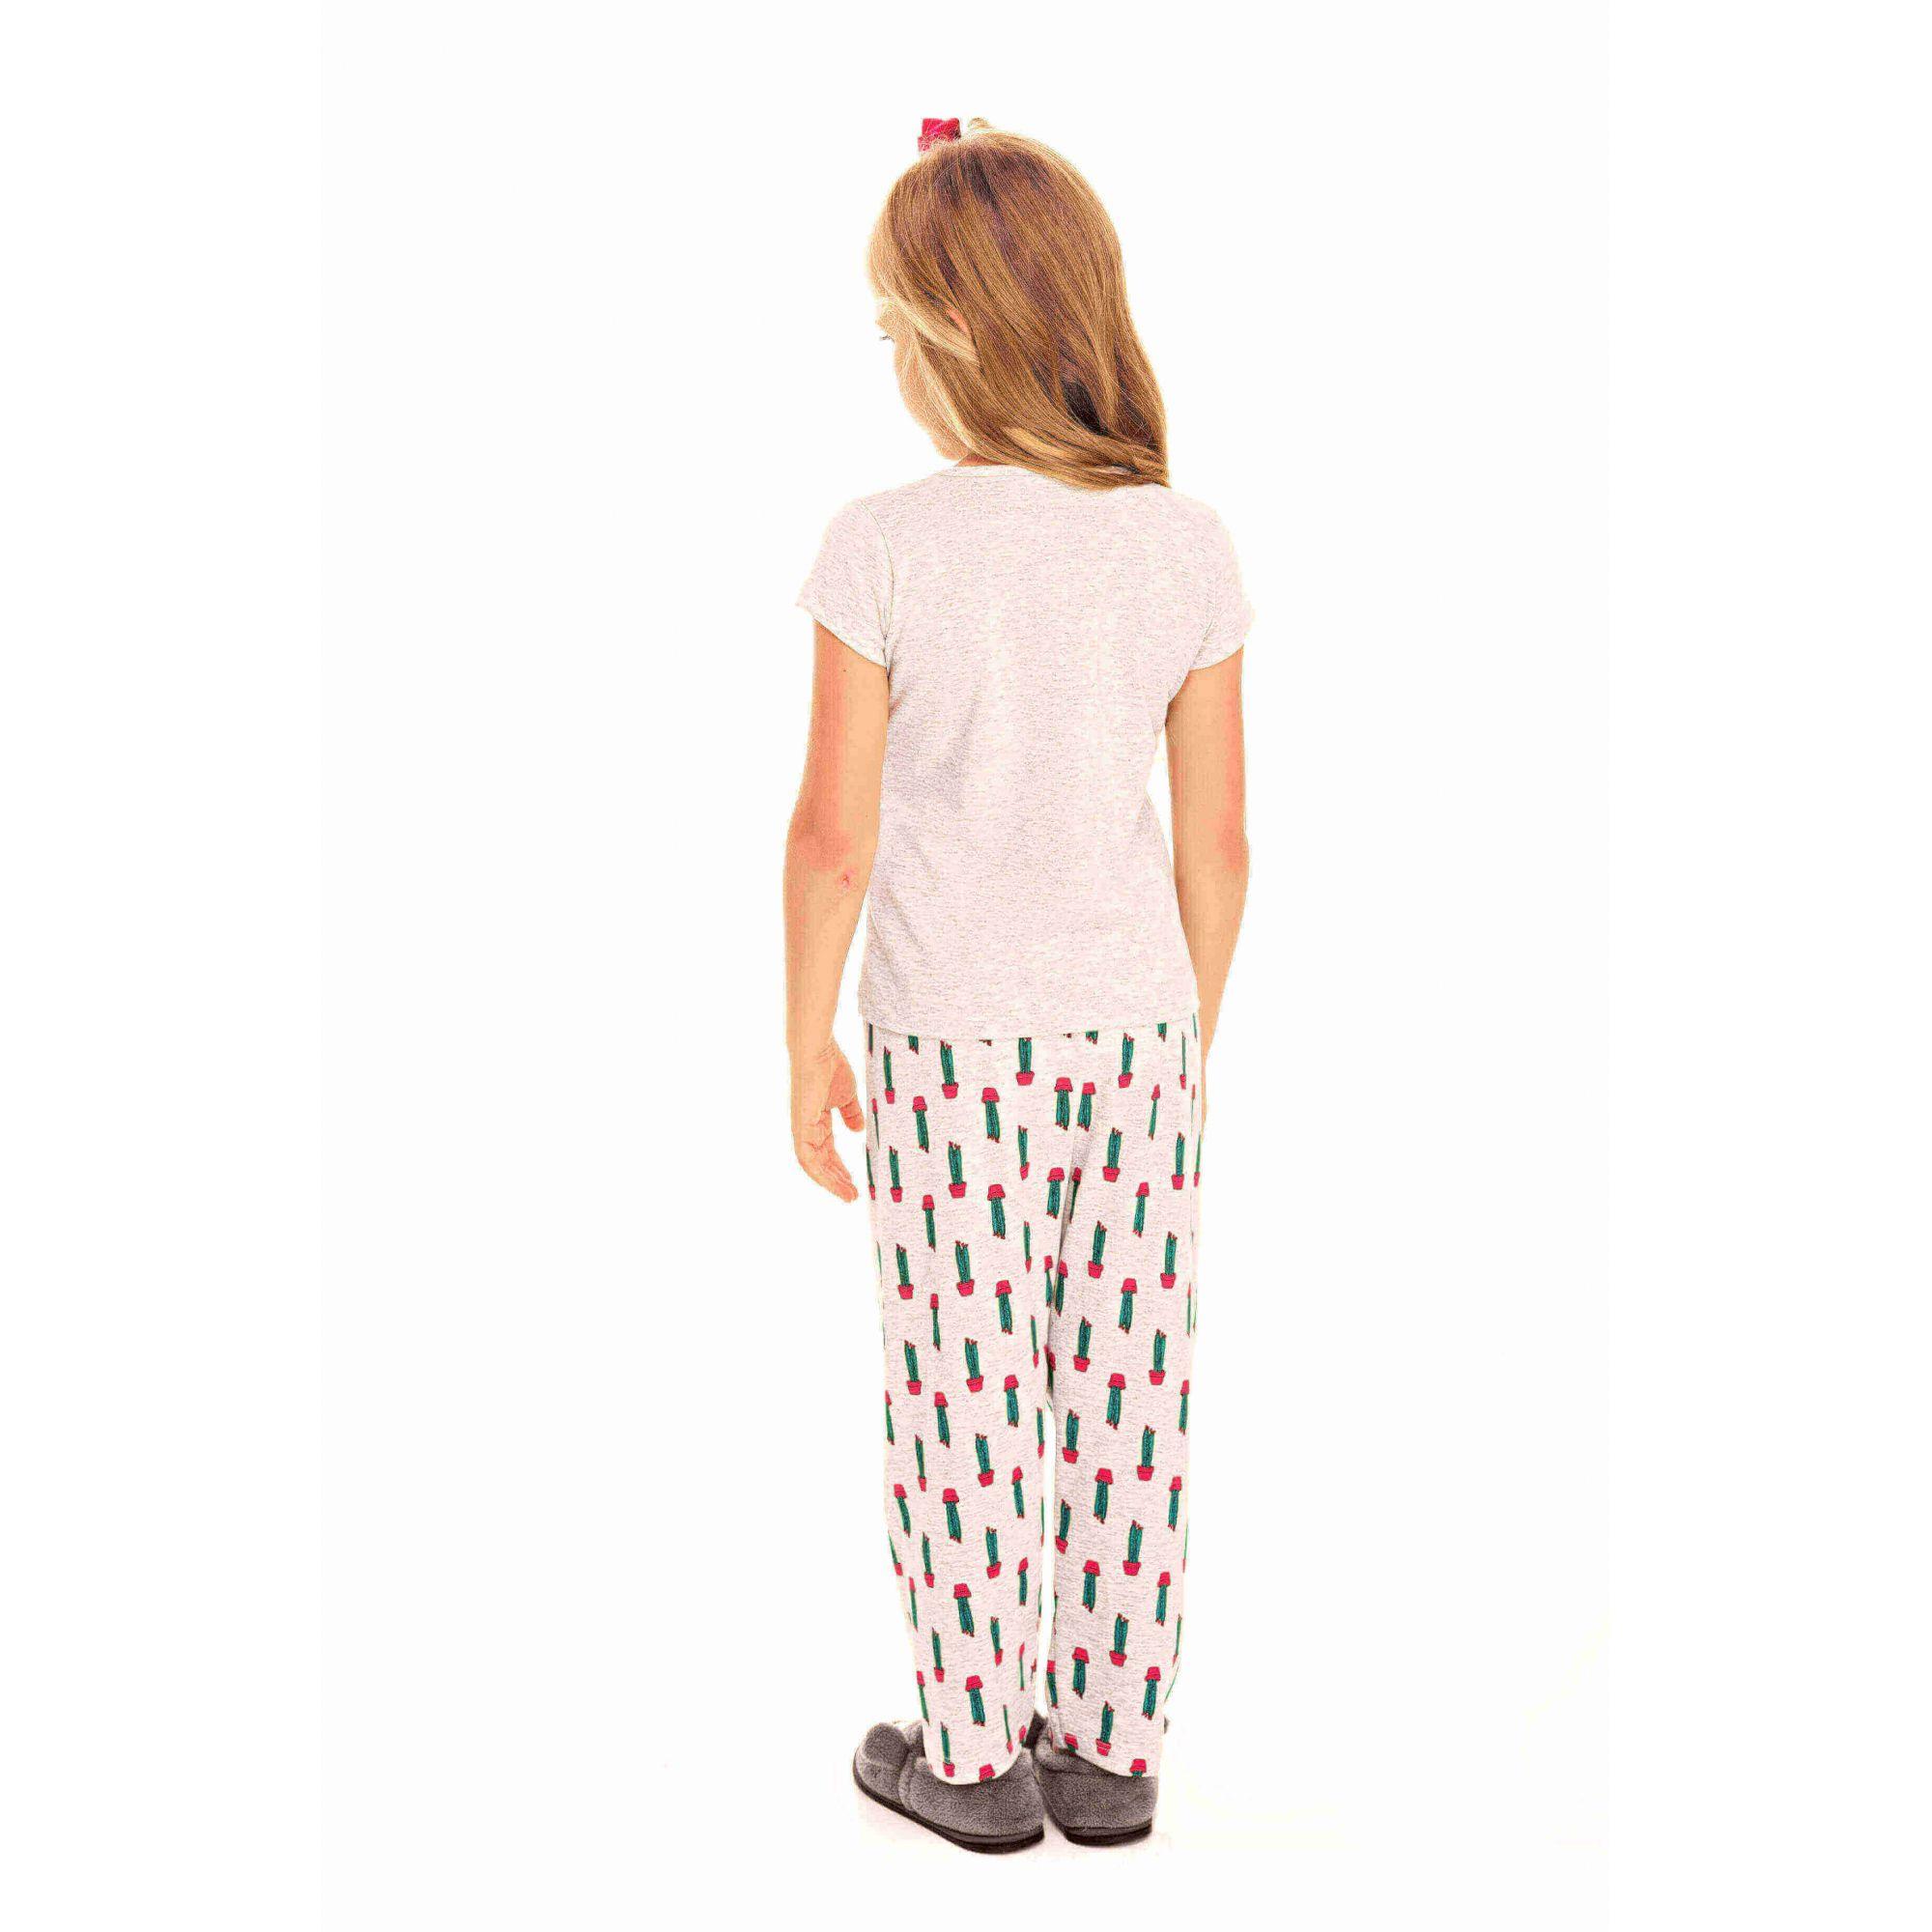 091/C - Pijama Infantil Feminino Cactos